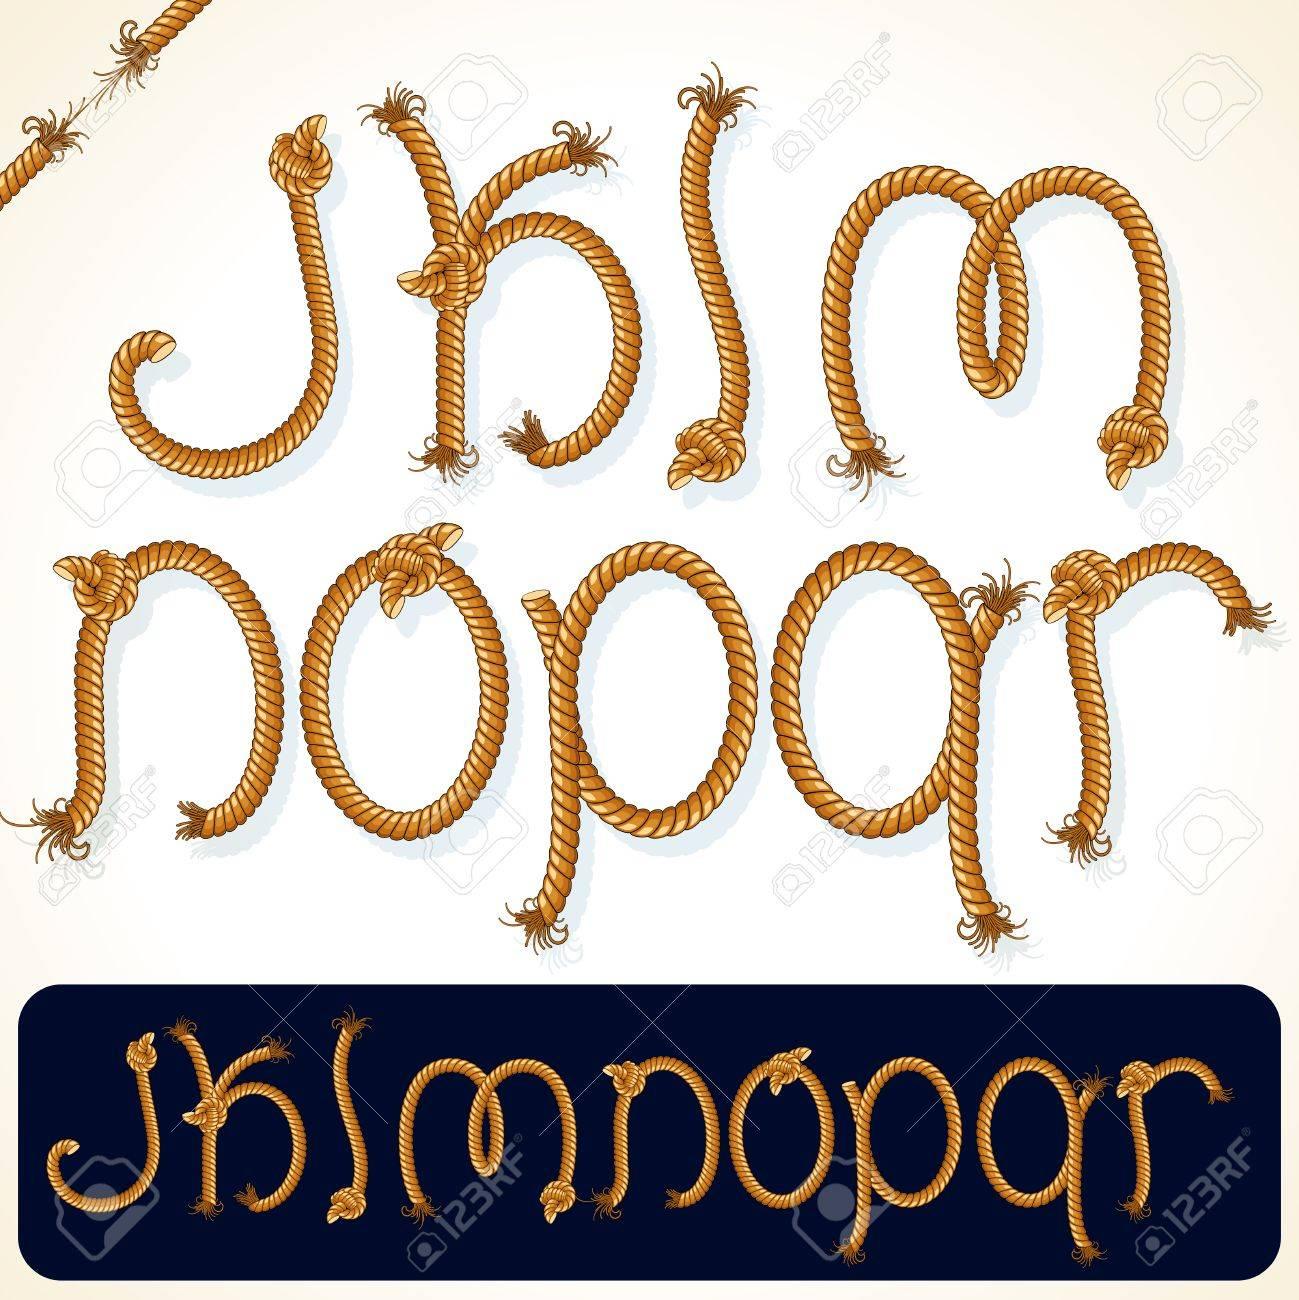 Detailed Rope Alphabet Illustration 2. Stock Illustration - 22957782